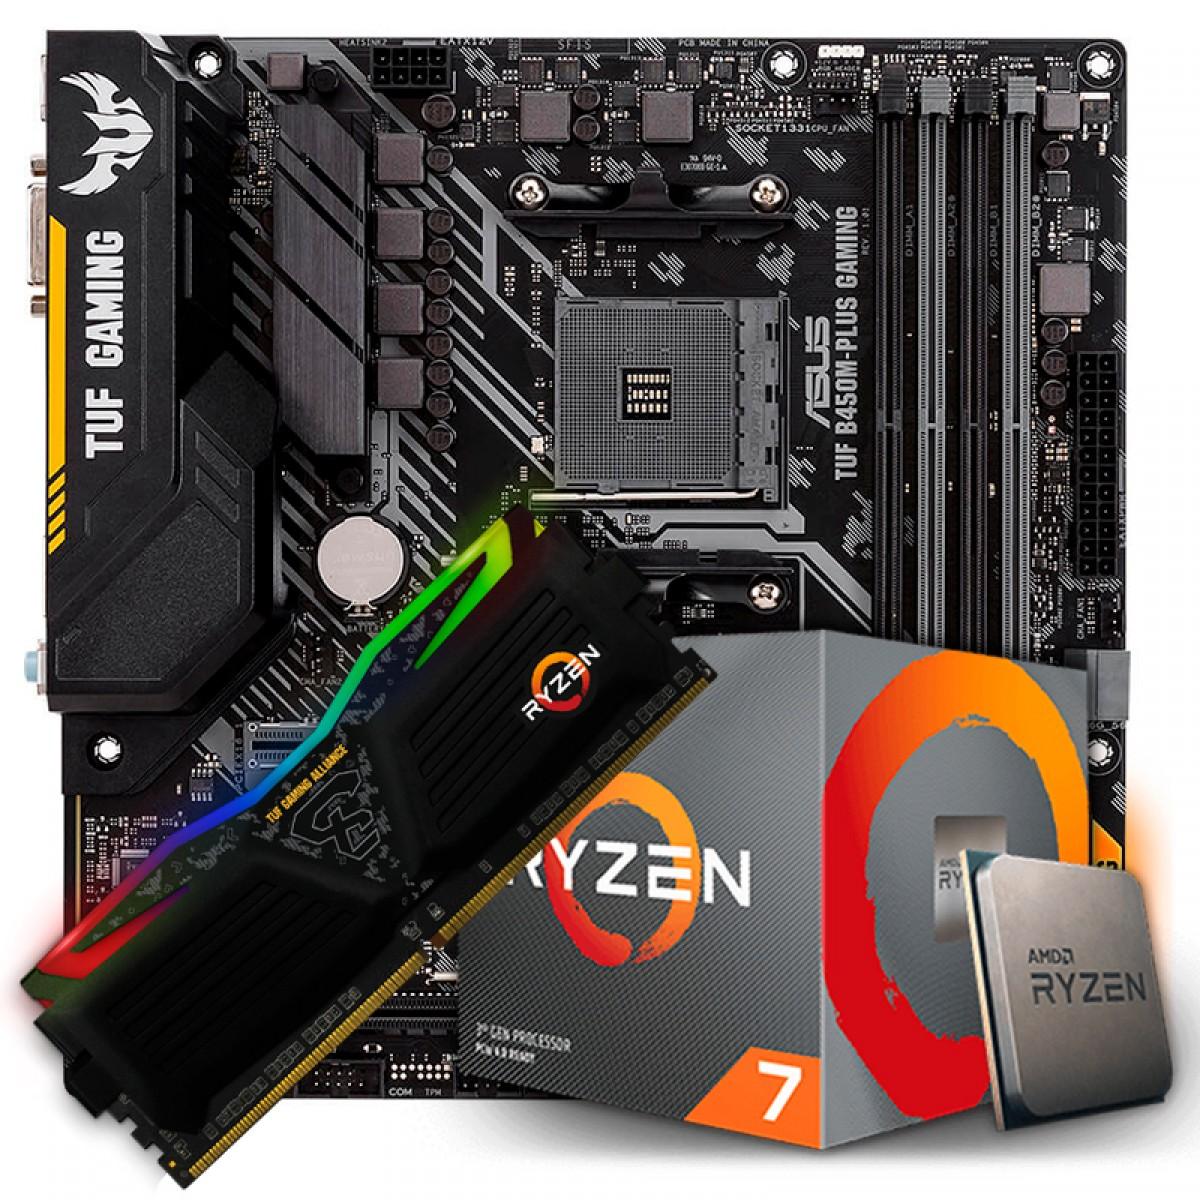 Kit Upgrade, AMD Ryzen 7 3700X, Asus TUF B450M-PLUS GAMING, Memória TUF DDR4 8GB 3000MHz